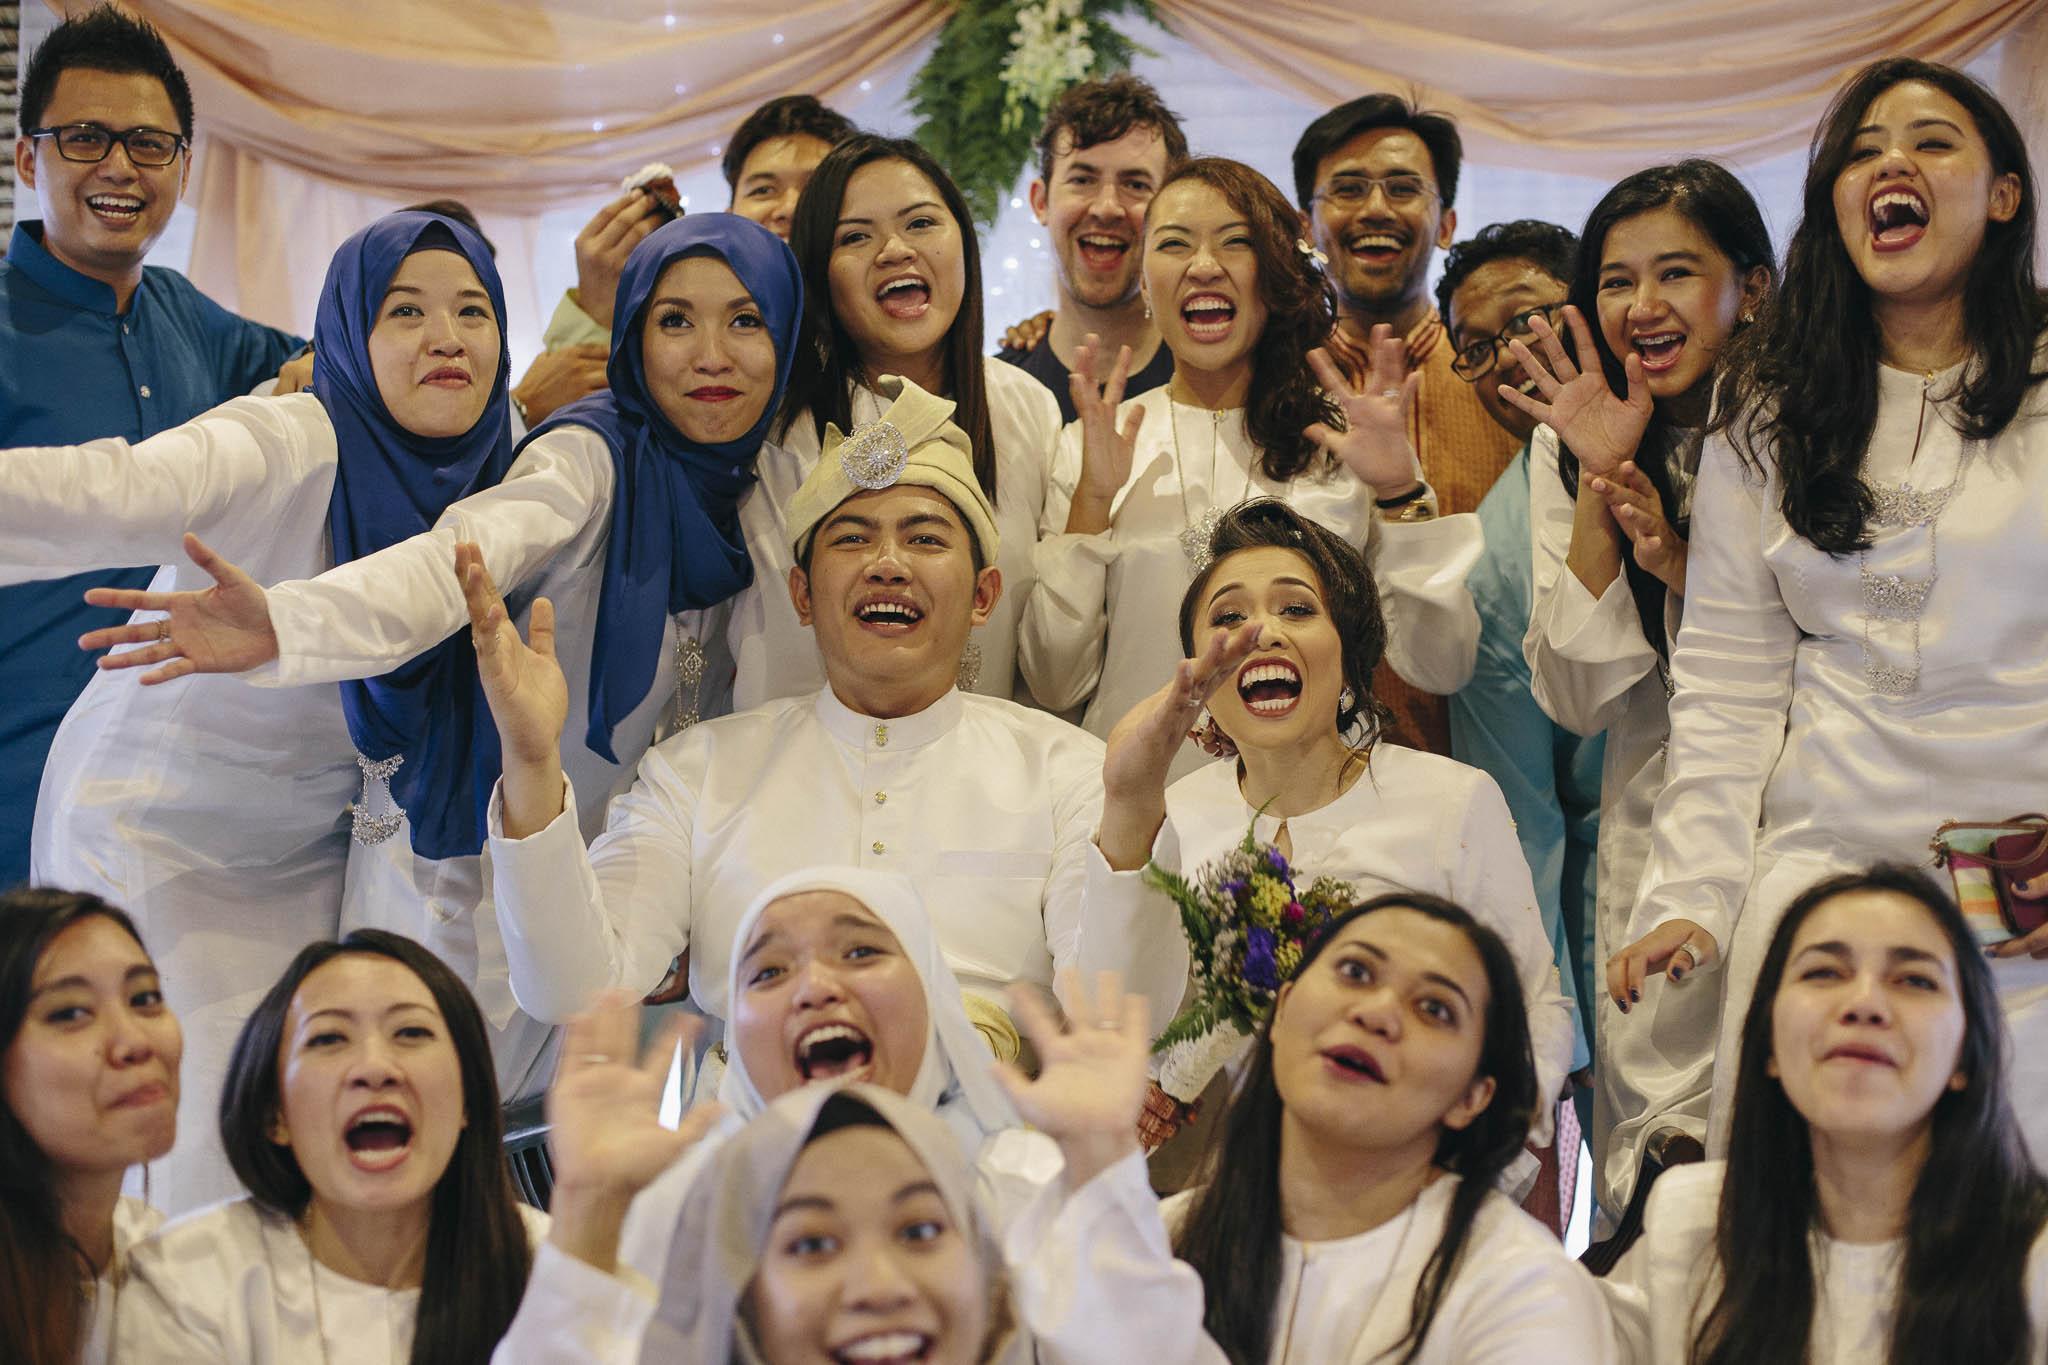 singapore-wedding-photographer-travel-khairul-atikah-71.jpg